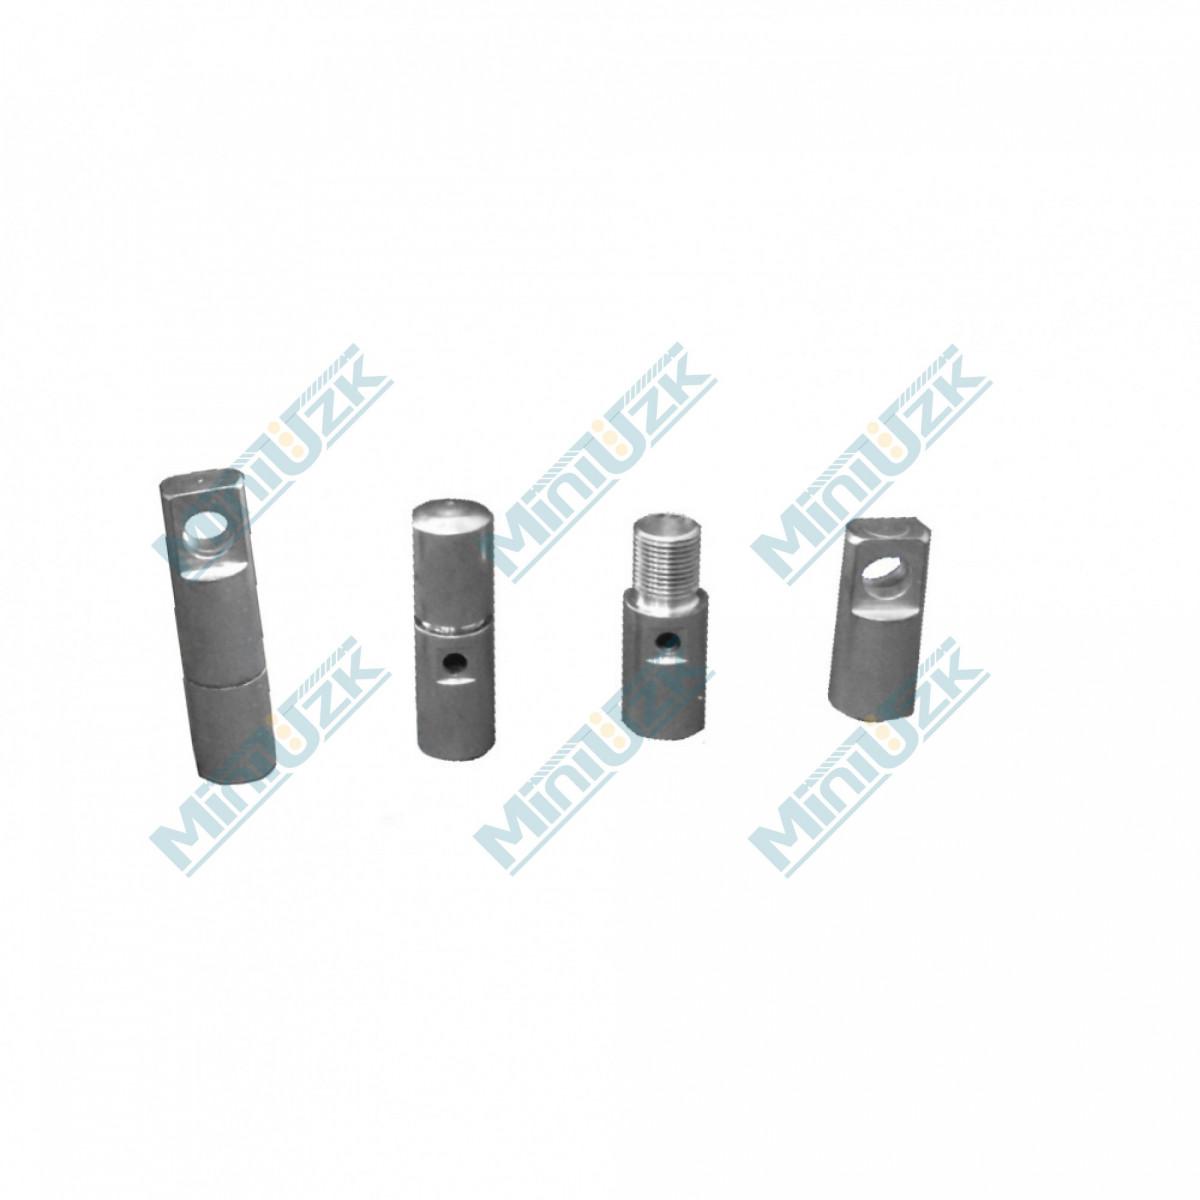 Устройство закладки кабеля (УЗК) OlmiOn СП-Т1-11/450